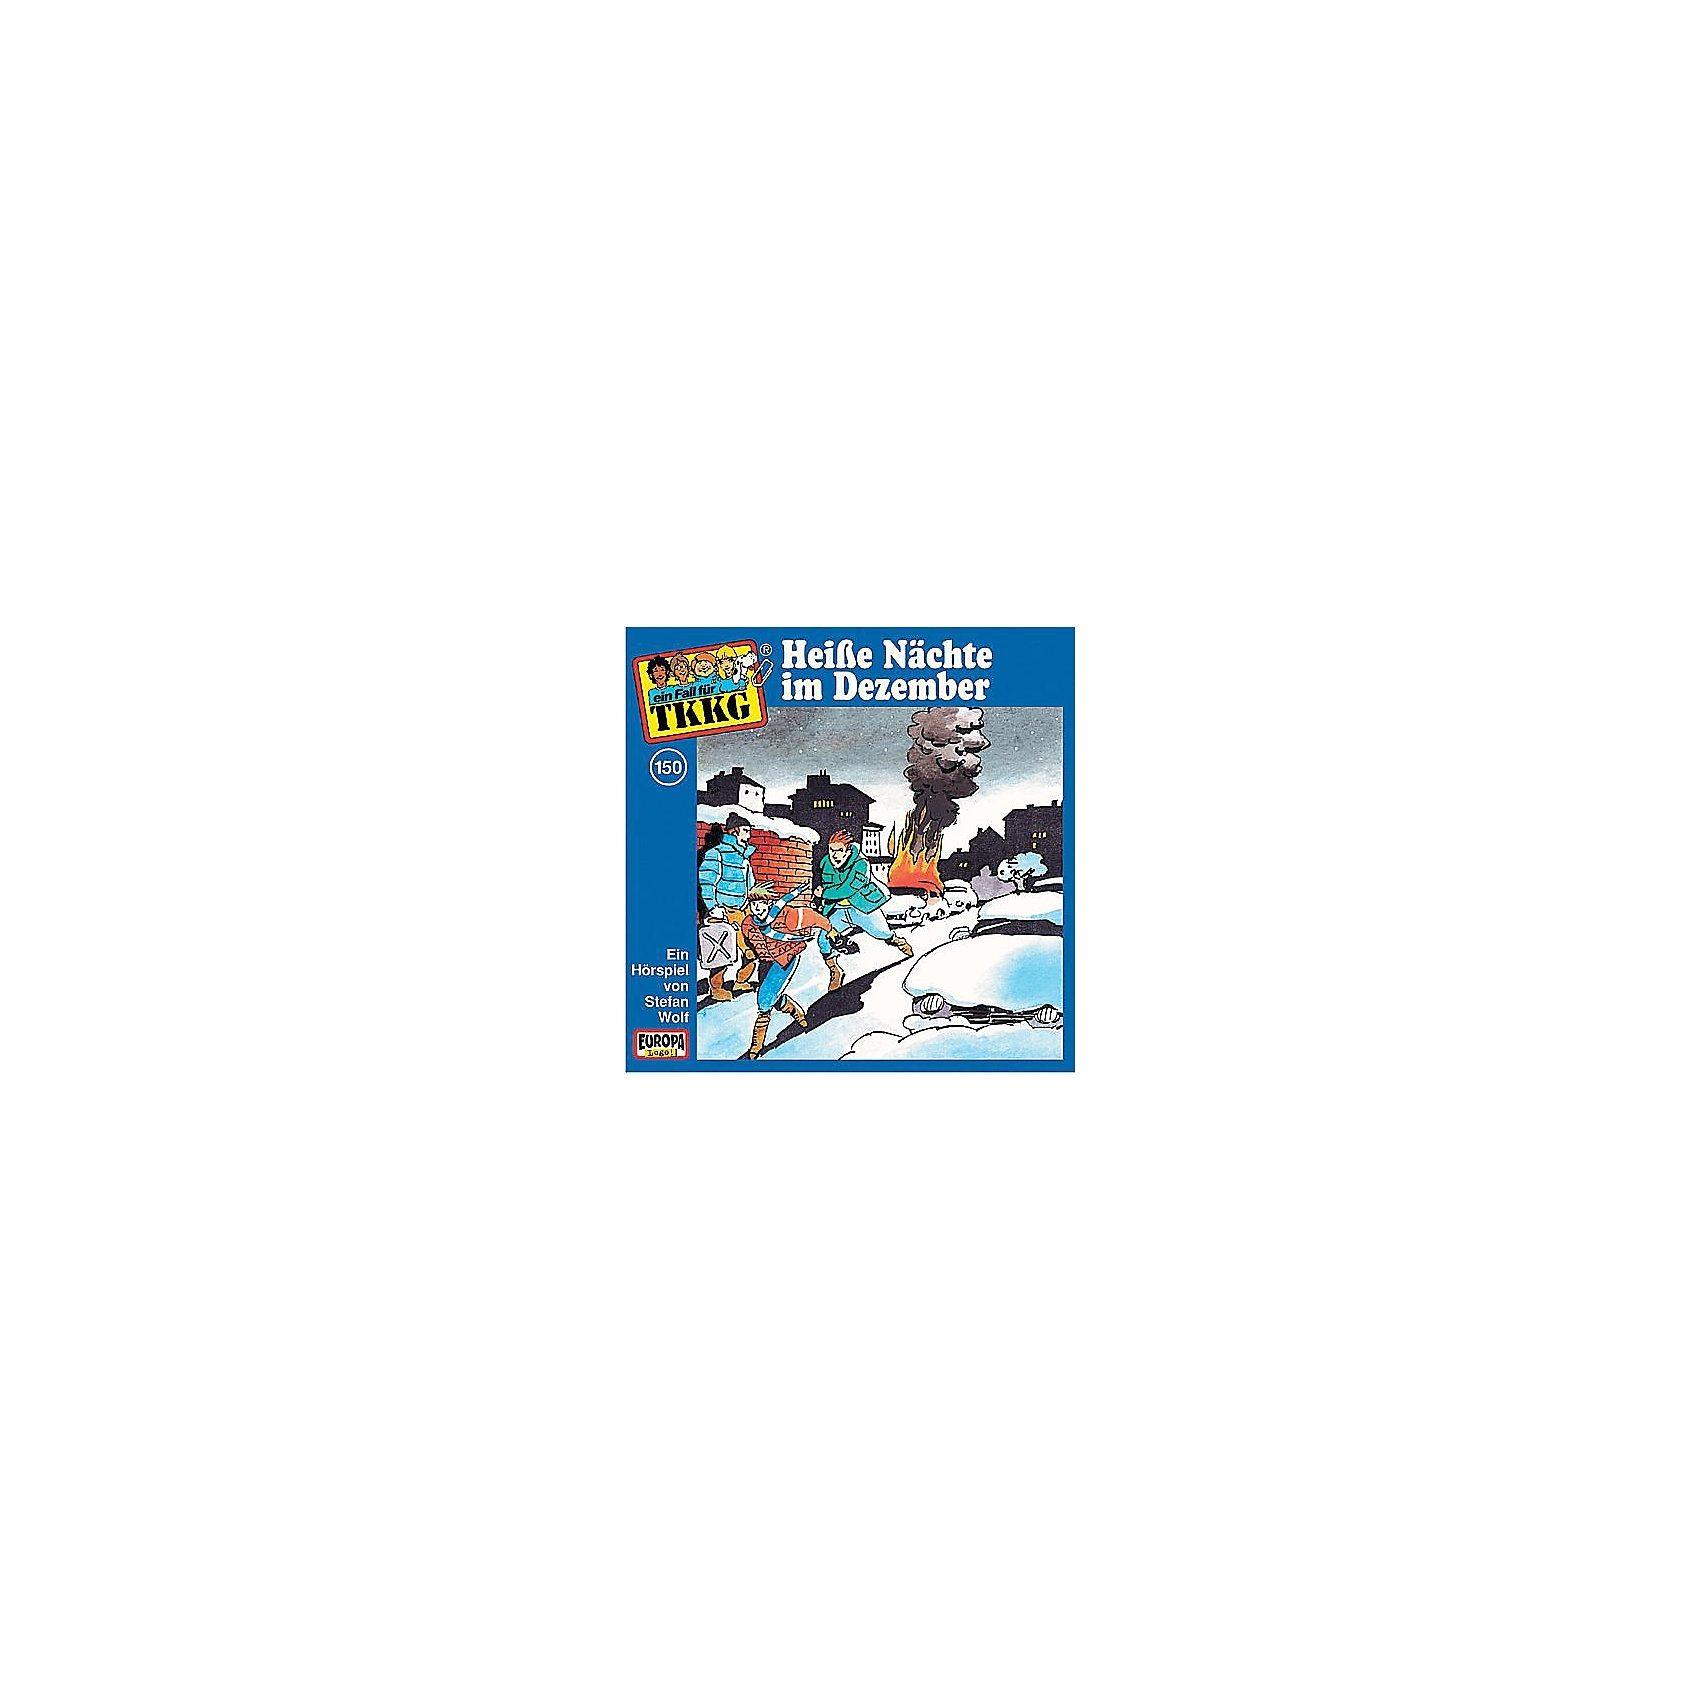 SONY BMG MUSIC CD TKKG 150 (Heisse Nächte im Dezember)